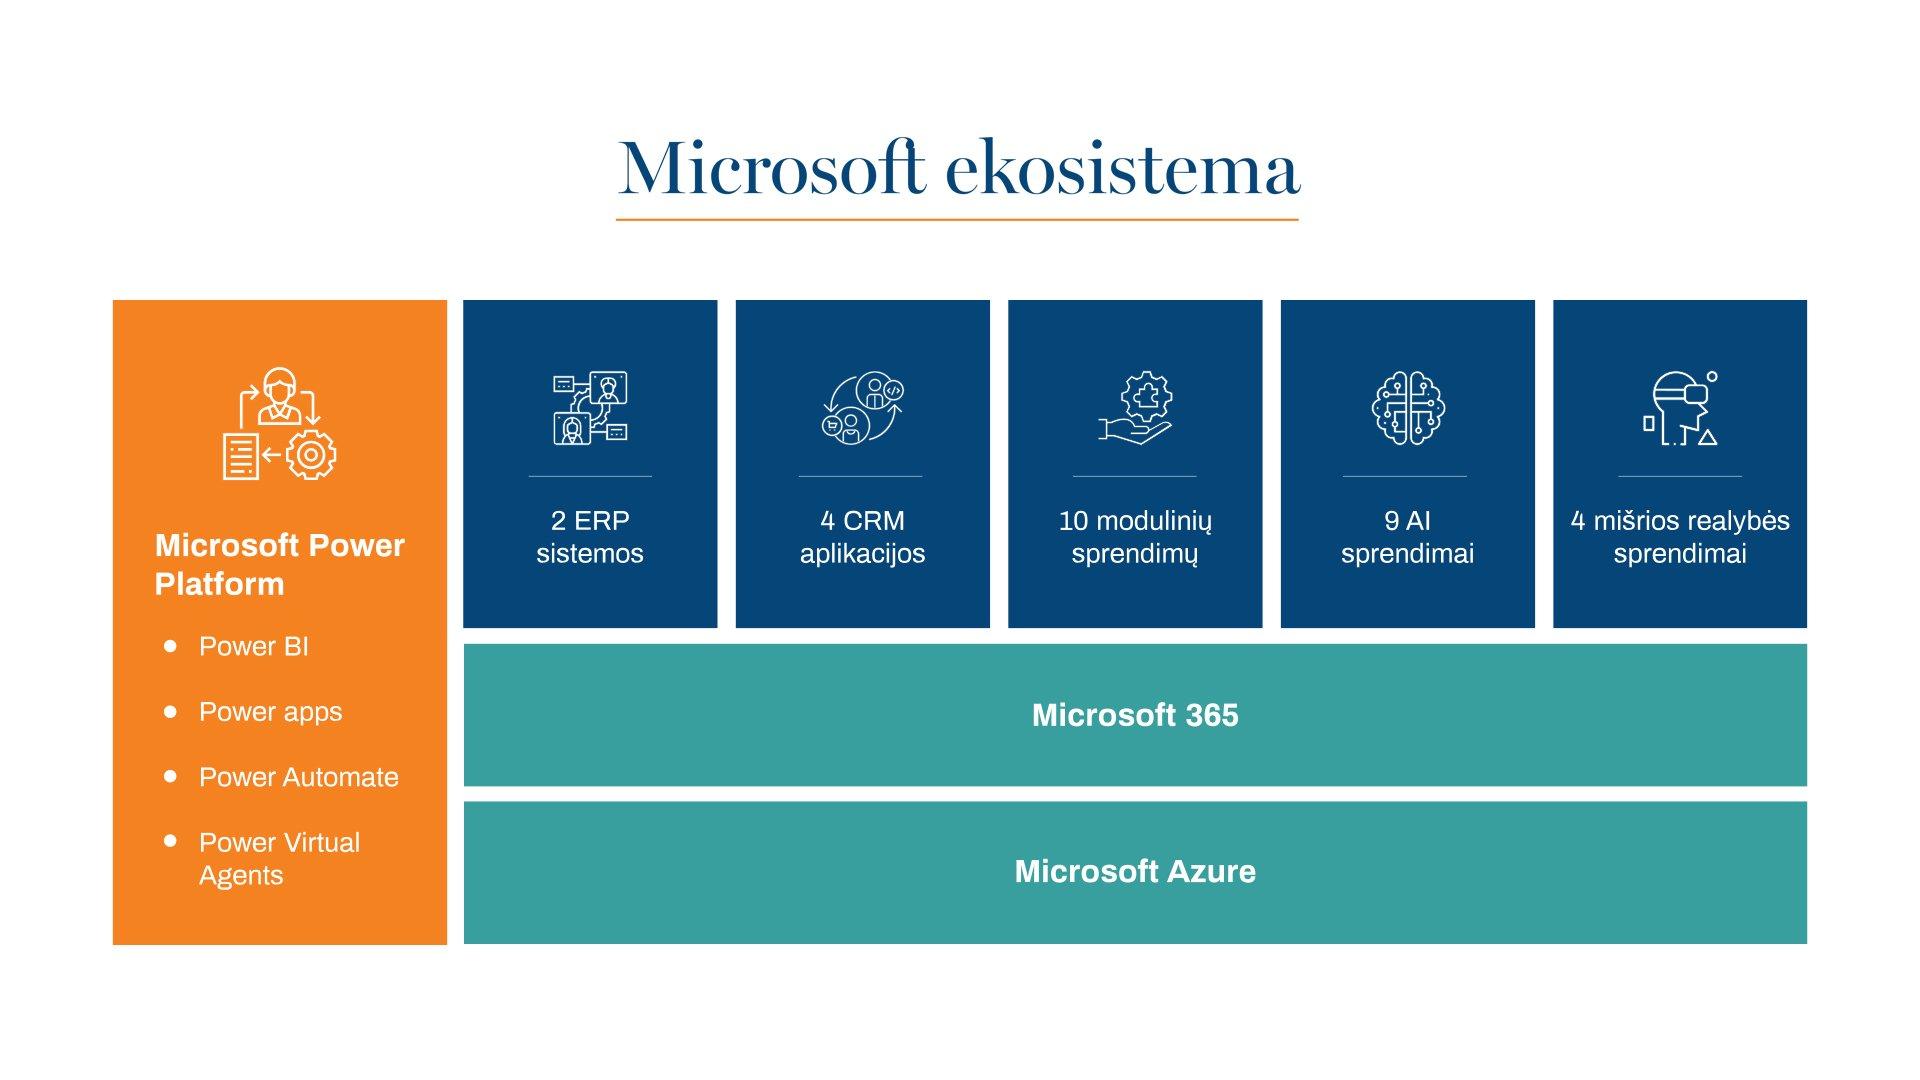 Microsoft Ekosistema